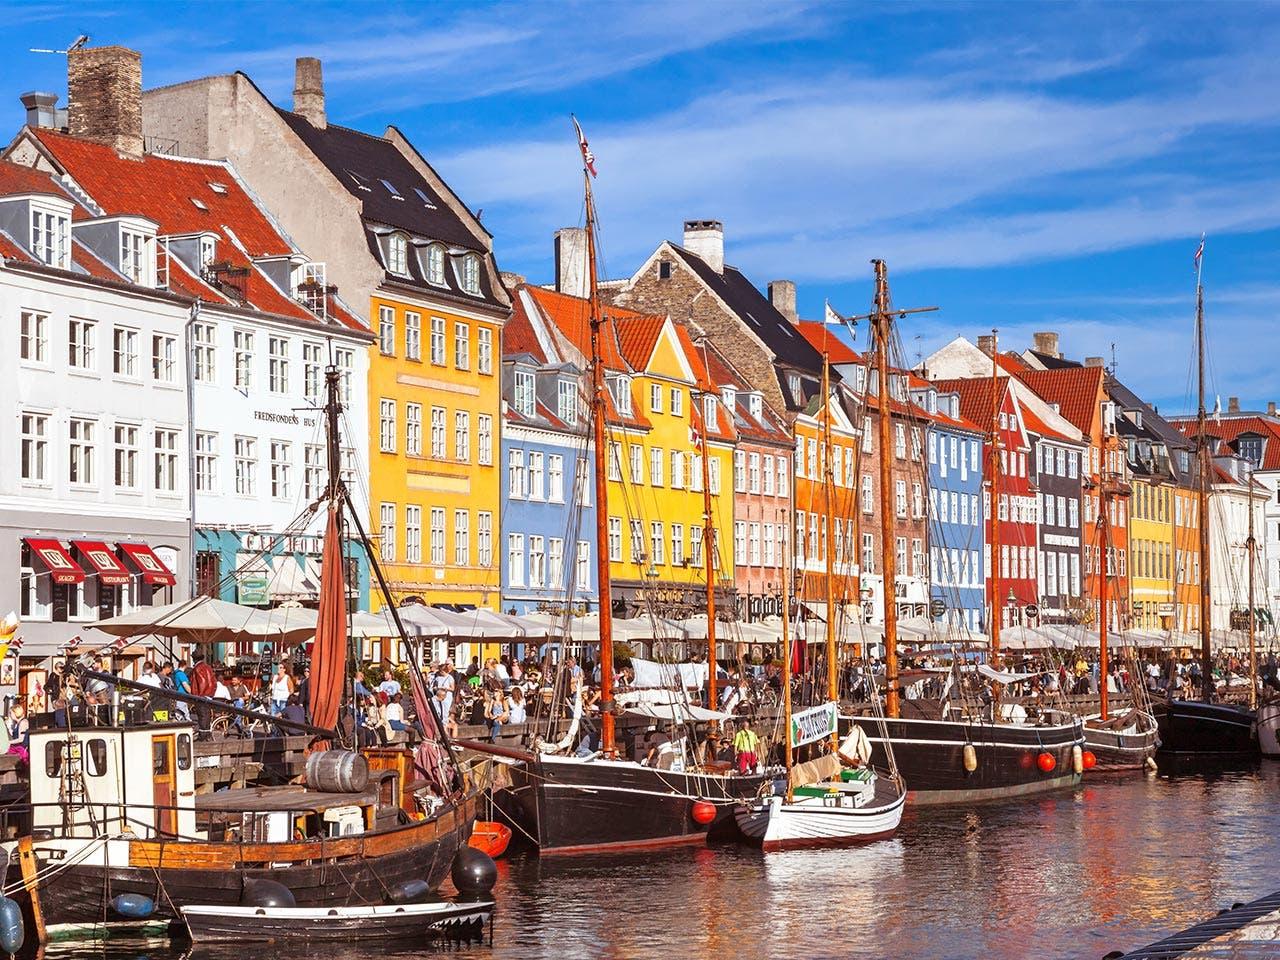 Denmark | alexdrim/Shutterstock.com